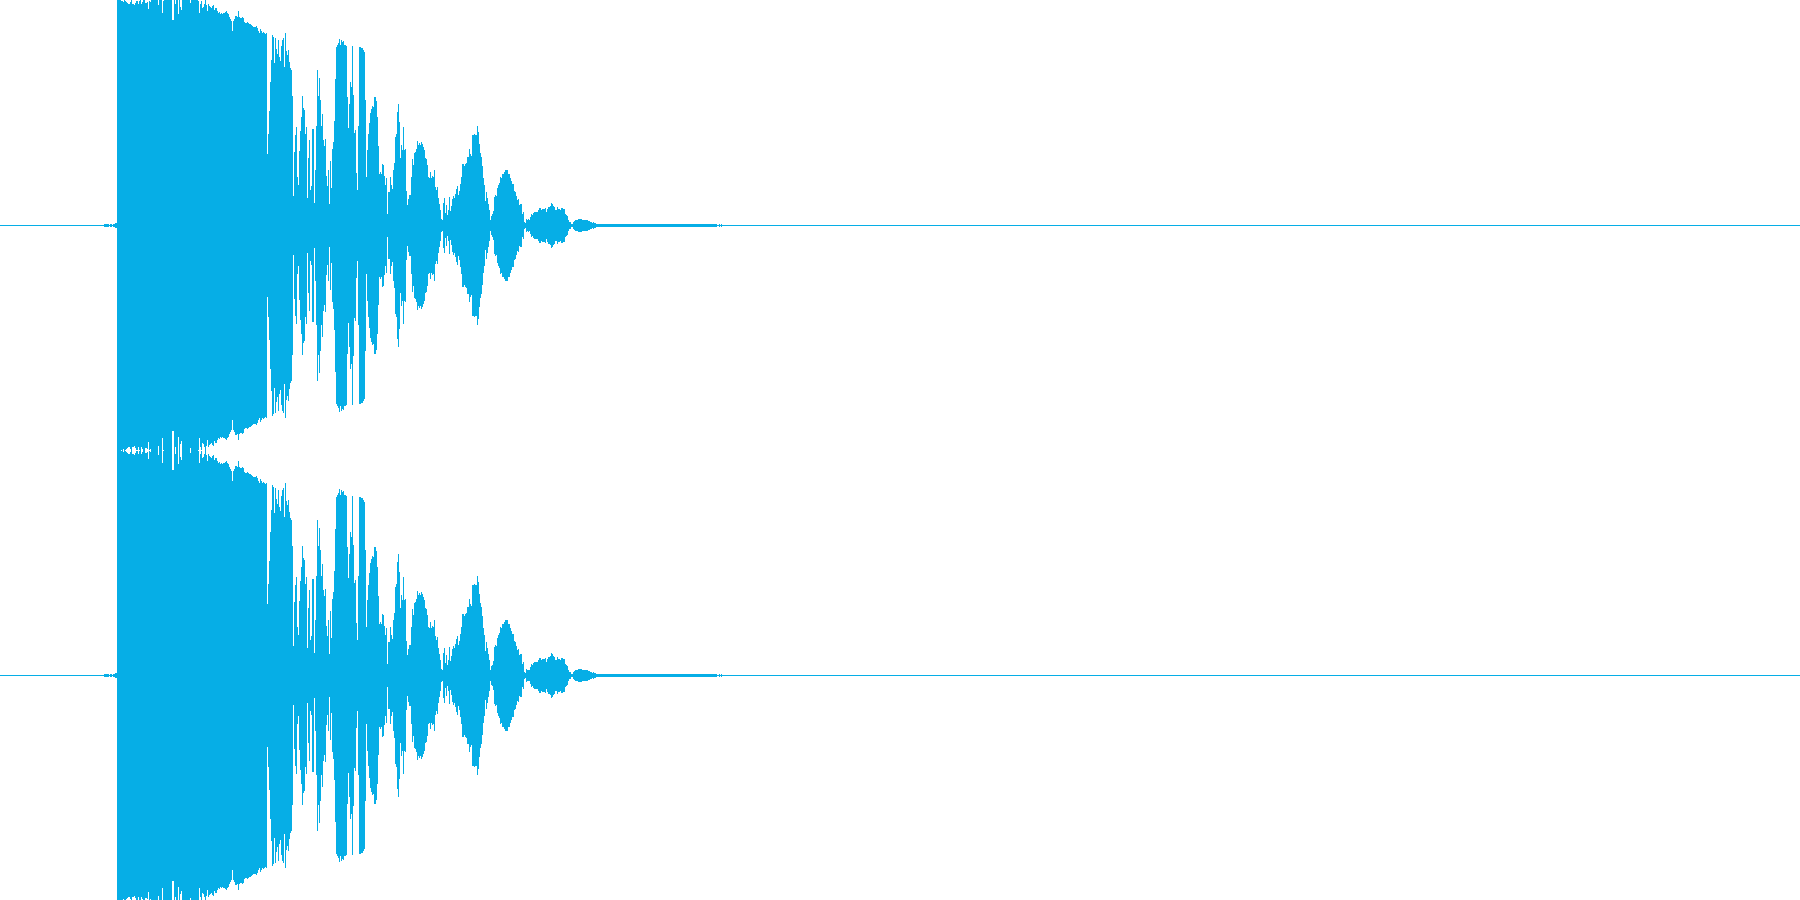 【SE】打撃音(パンチ05)の再生済みの波形